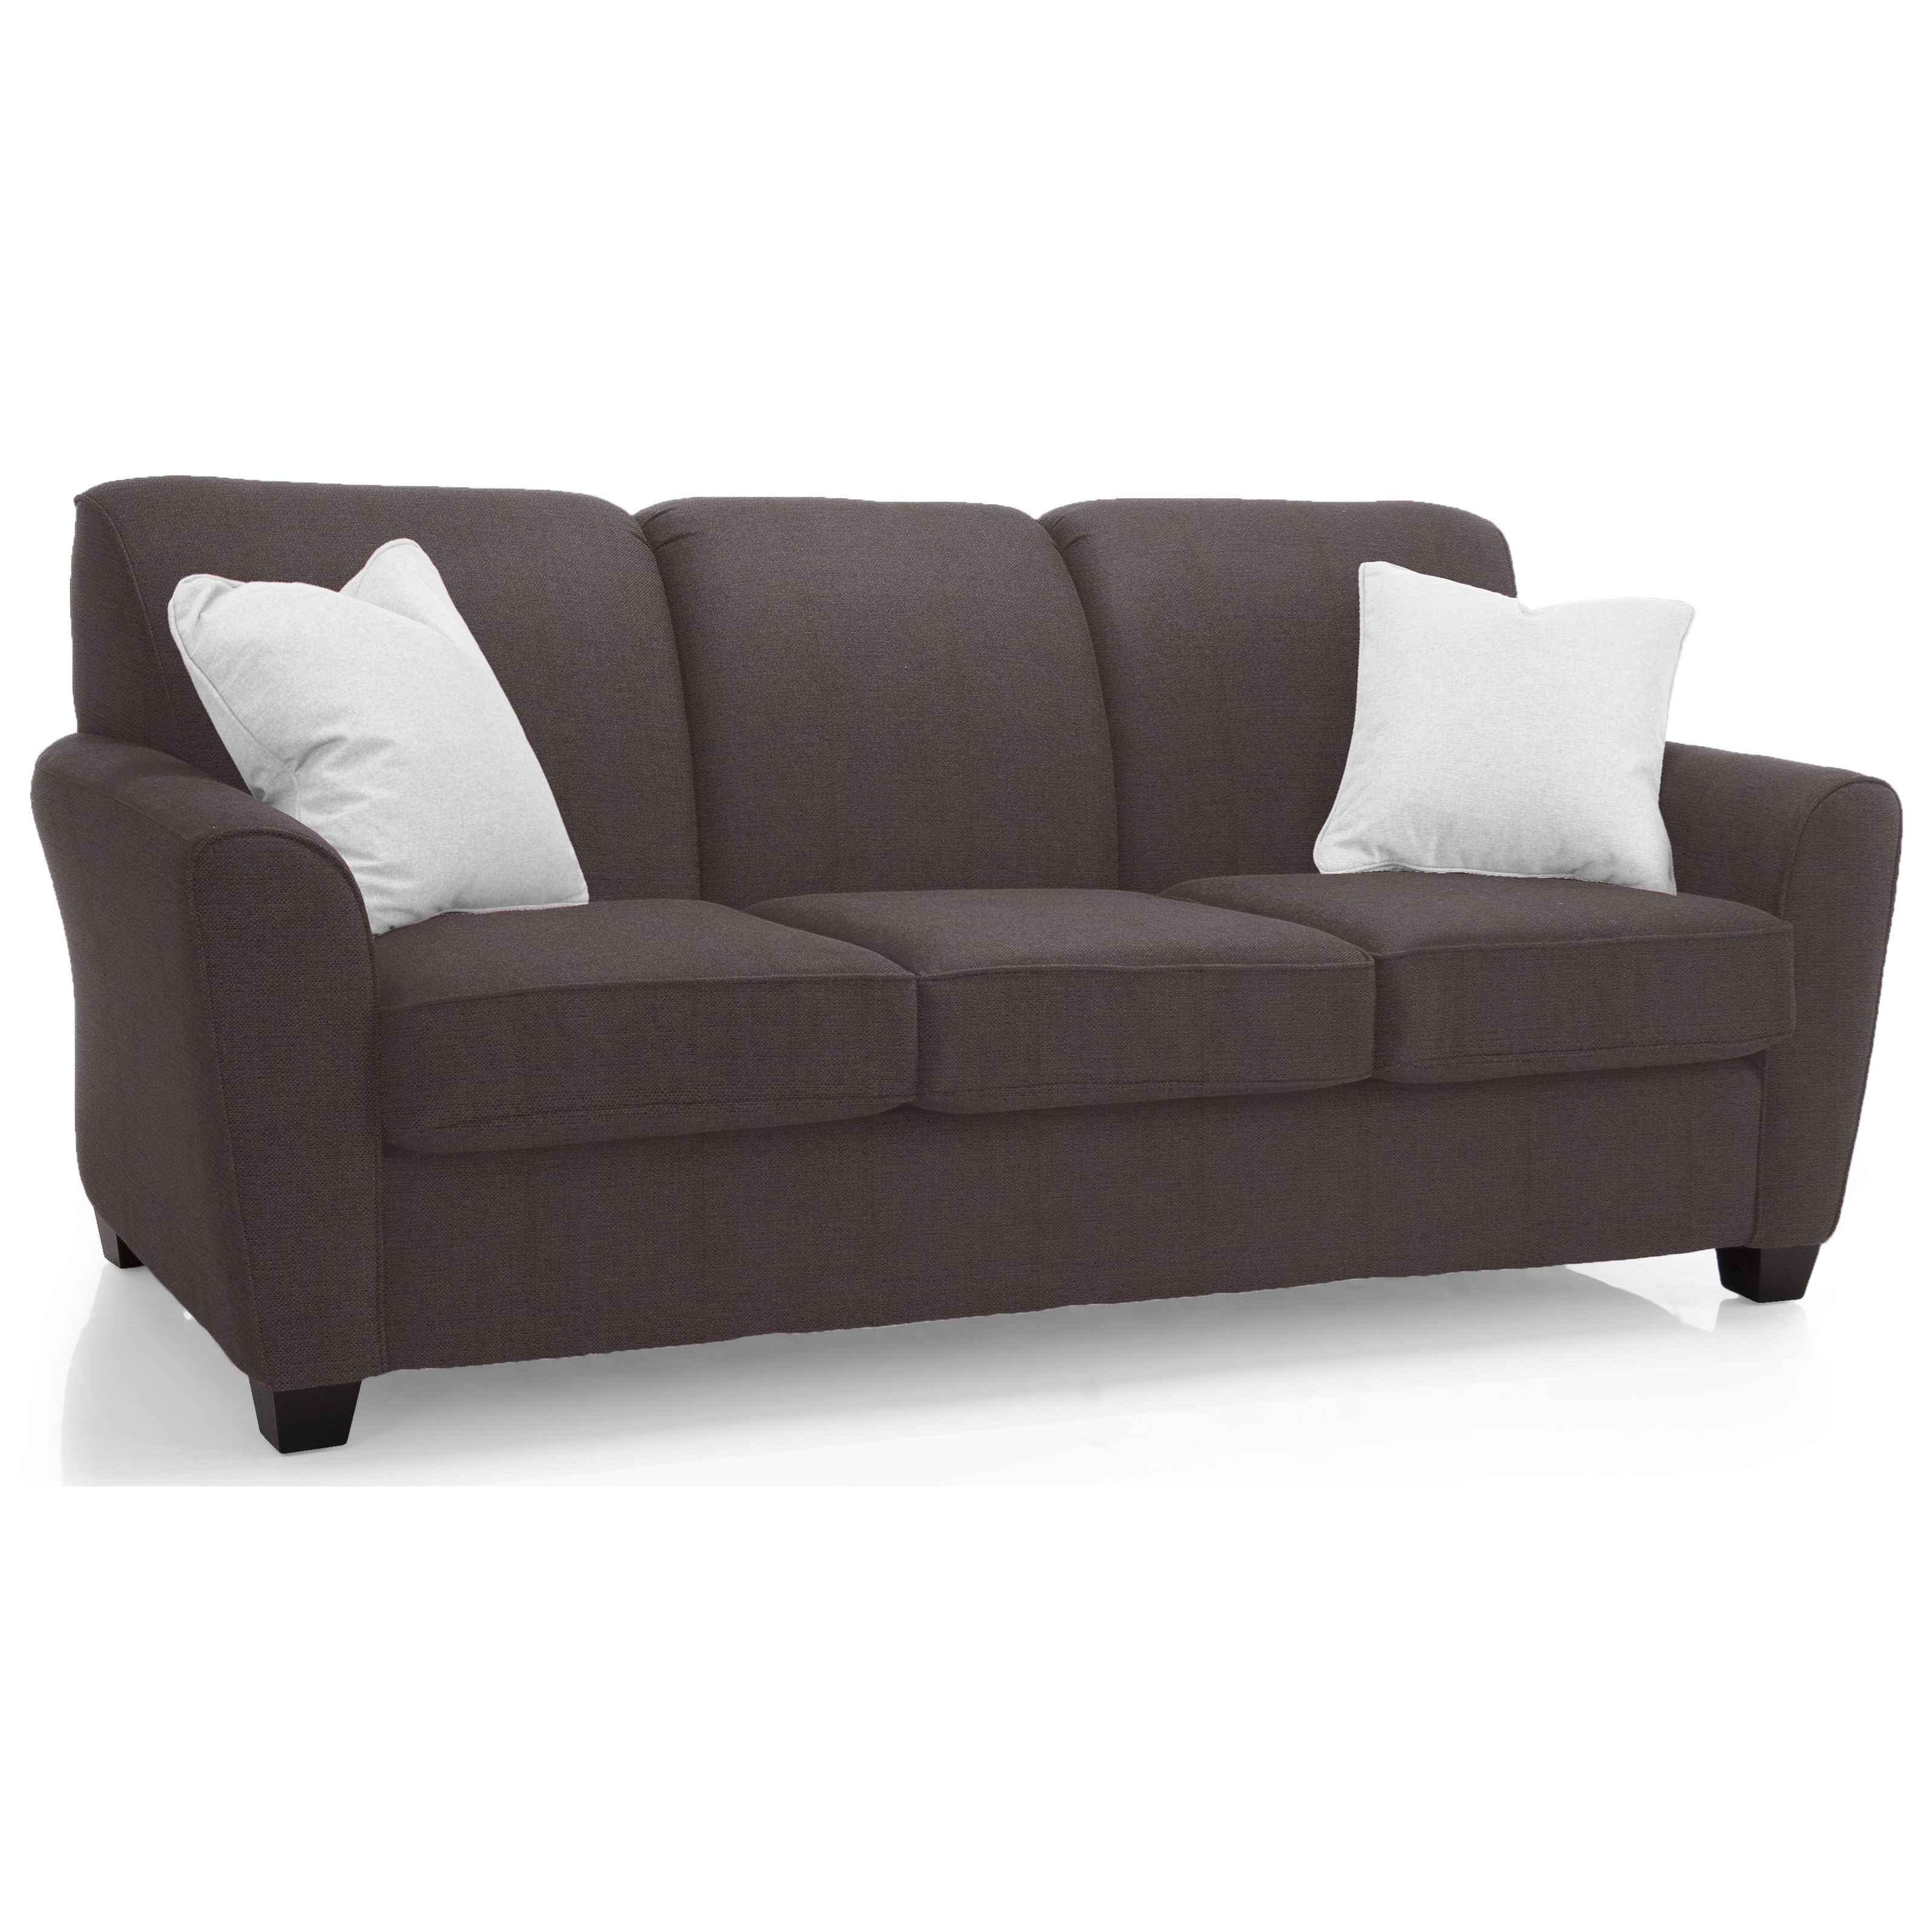 2404 Transitional Sofa by Decor-Rest at Lucas Furniture & Mattress